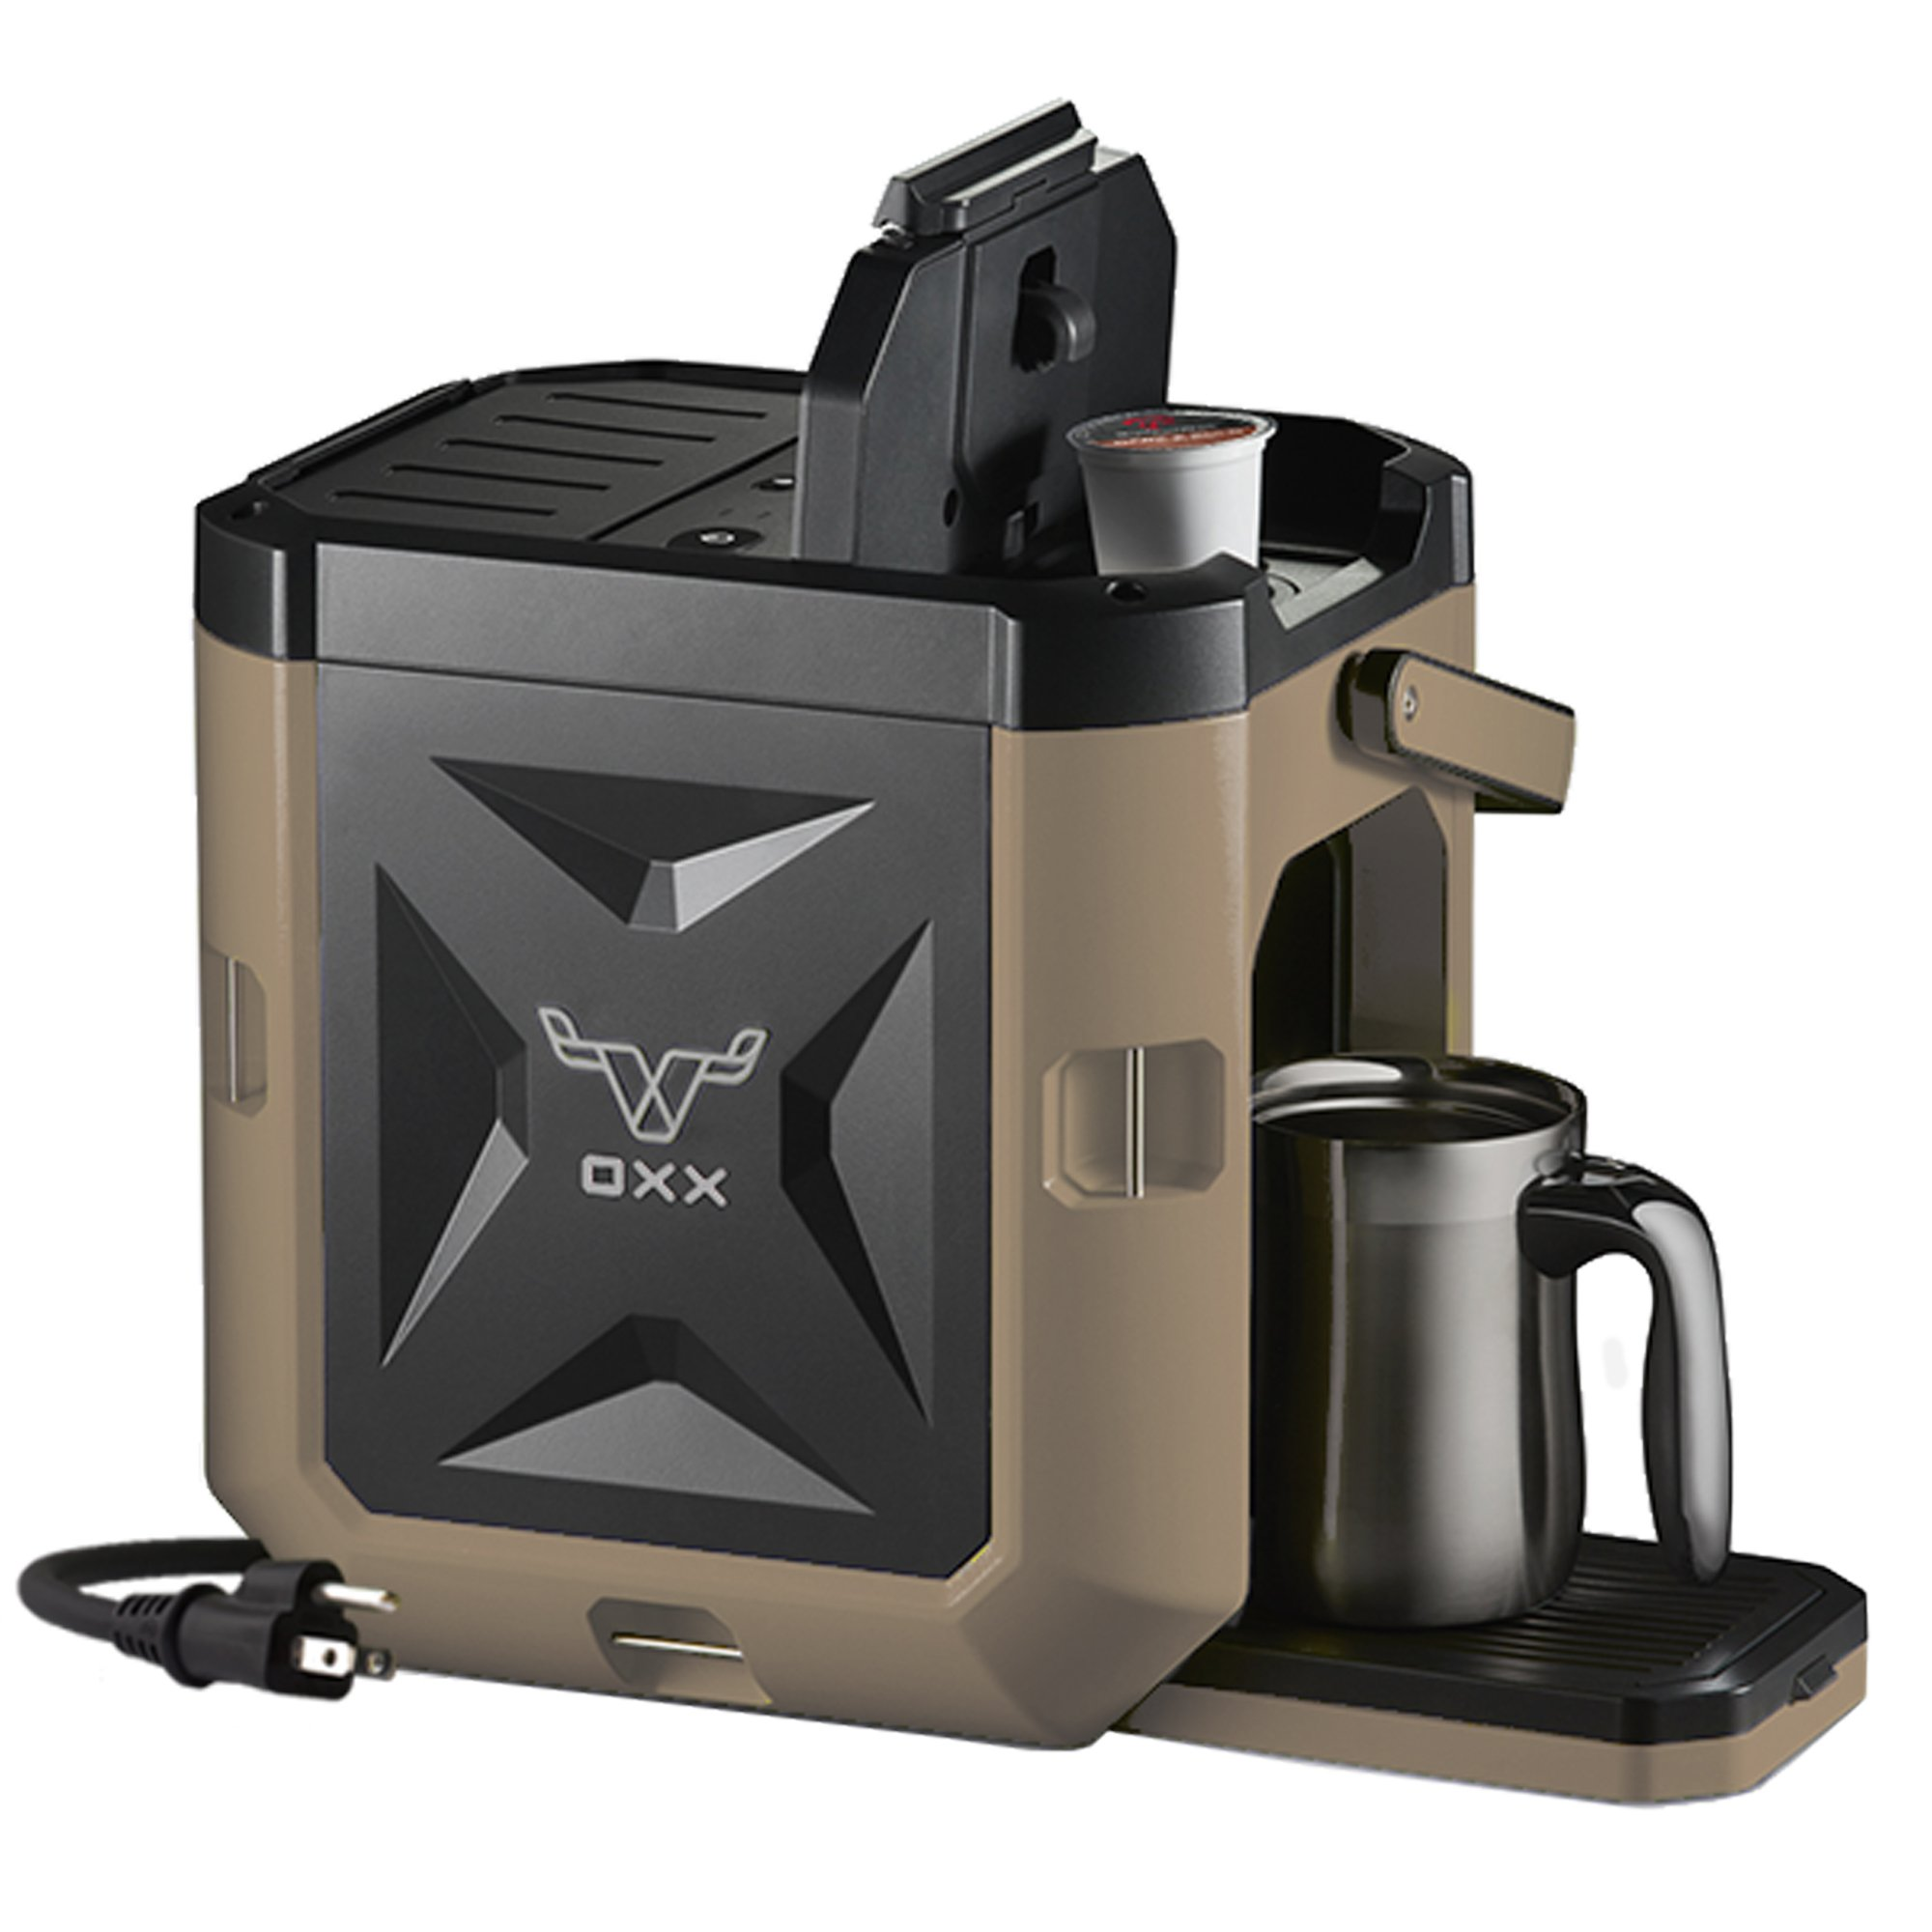 OXX COFFEEBOXX Job Site Single Serve Coffee Maker, Desert Tan by Oxx Inc (Image #1)